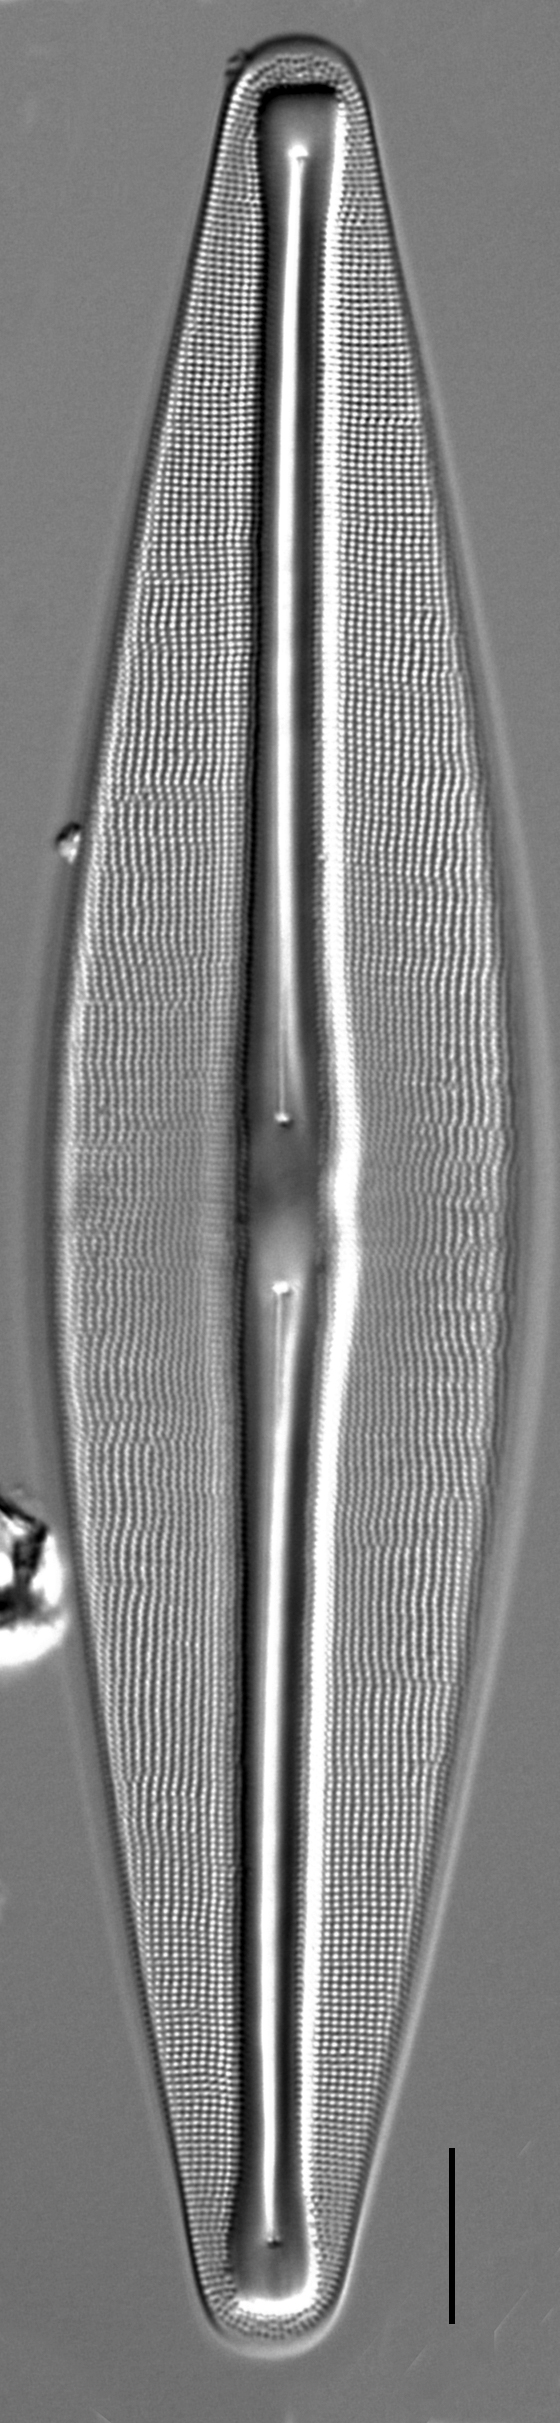 Frustulia bahlsii LM1